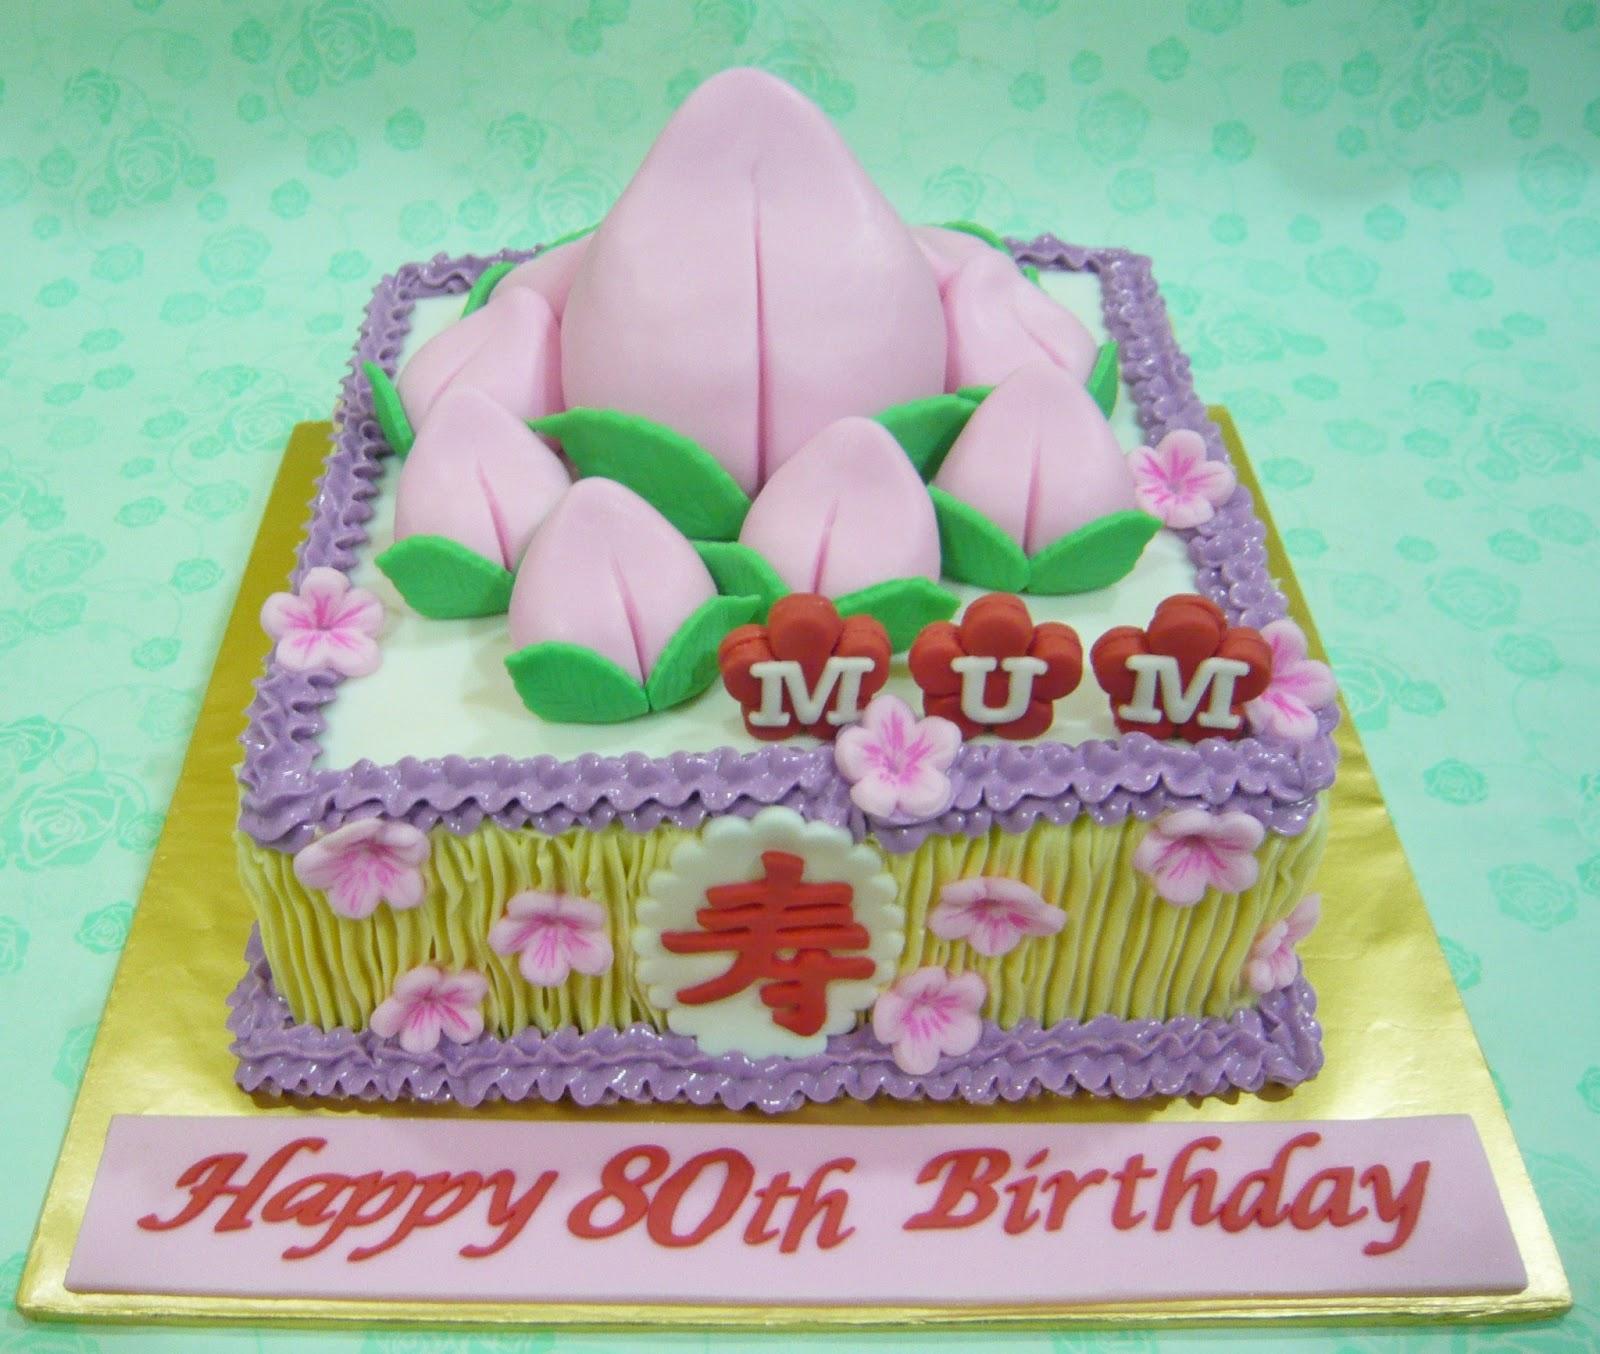 Cake Decorating Course In Hk : Jenn Cupcakes & Muffins: Longevity Peach Cake